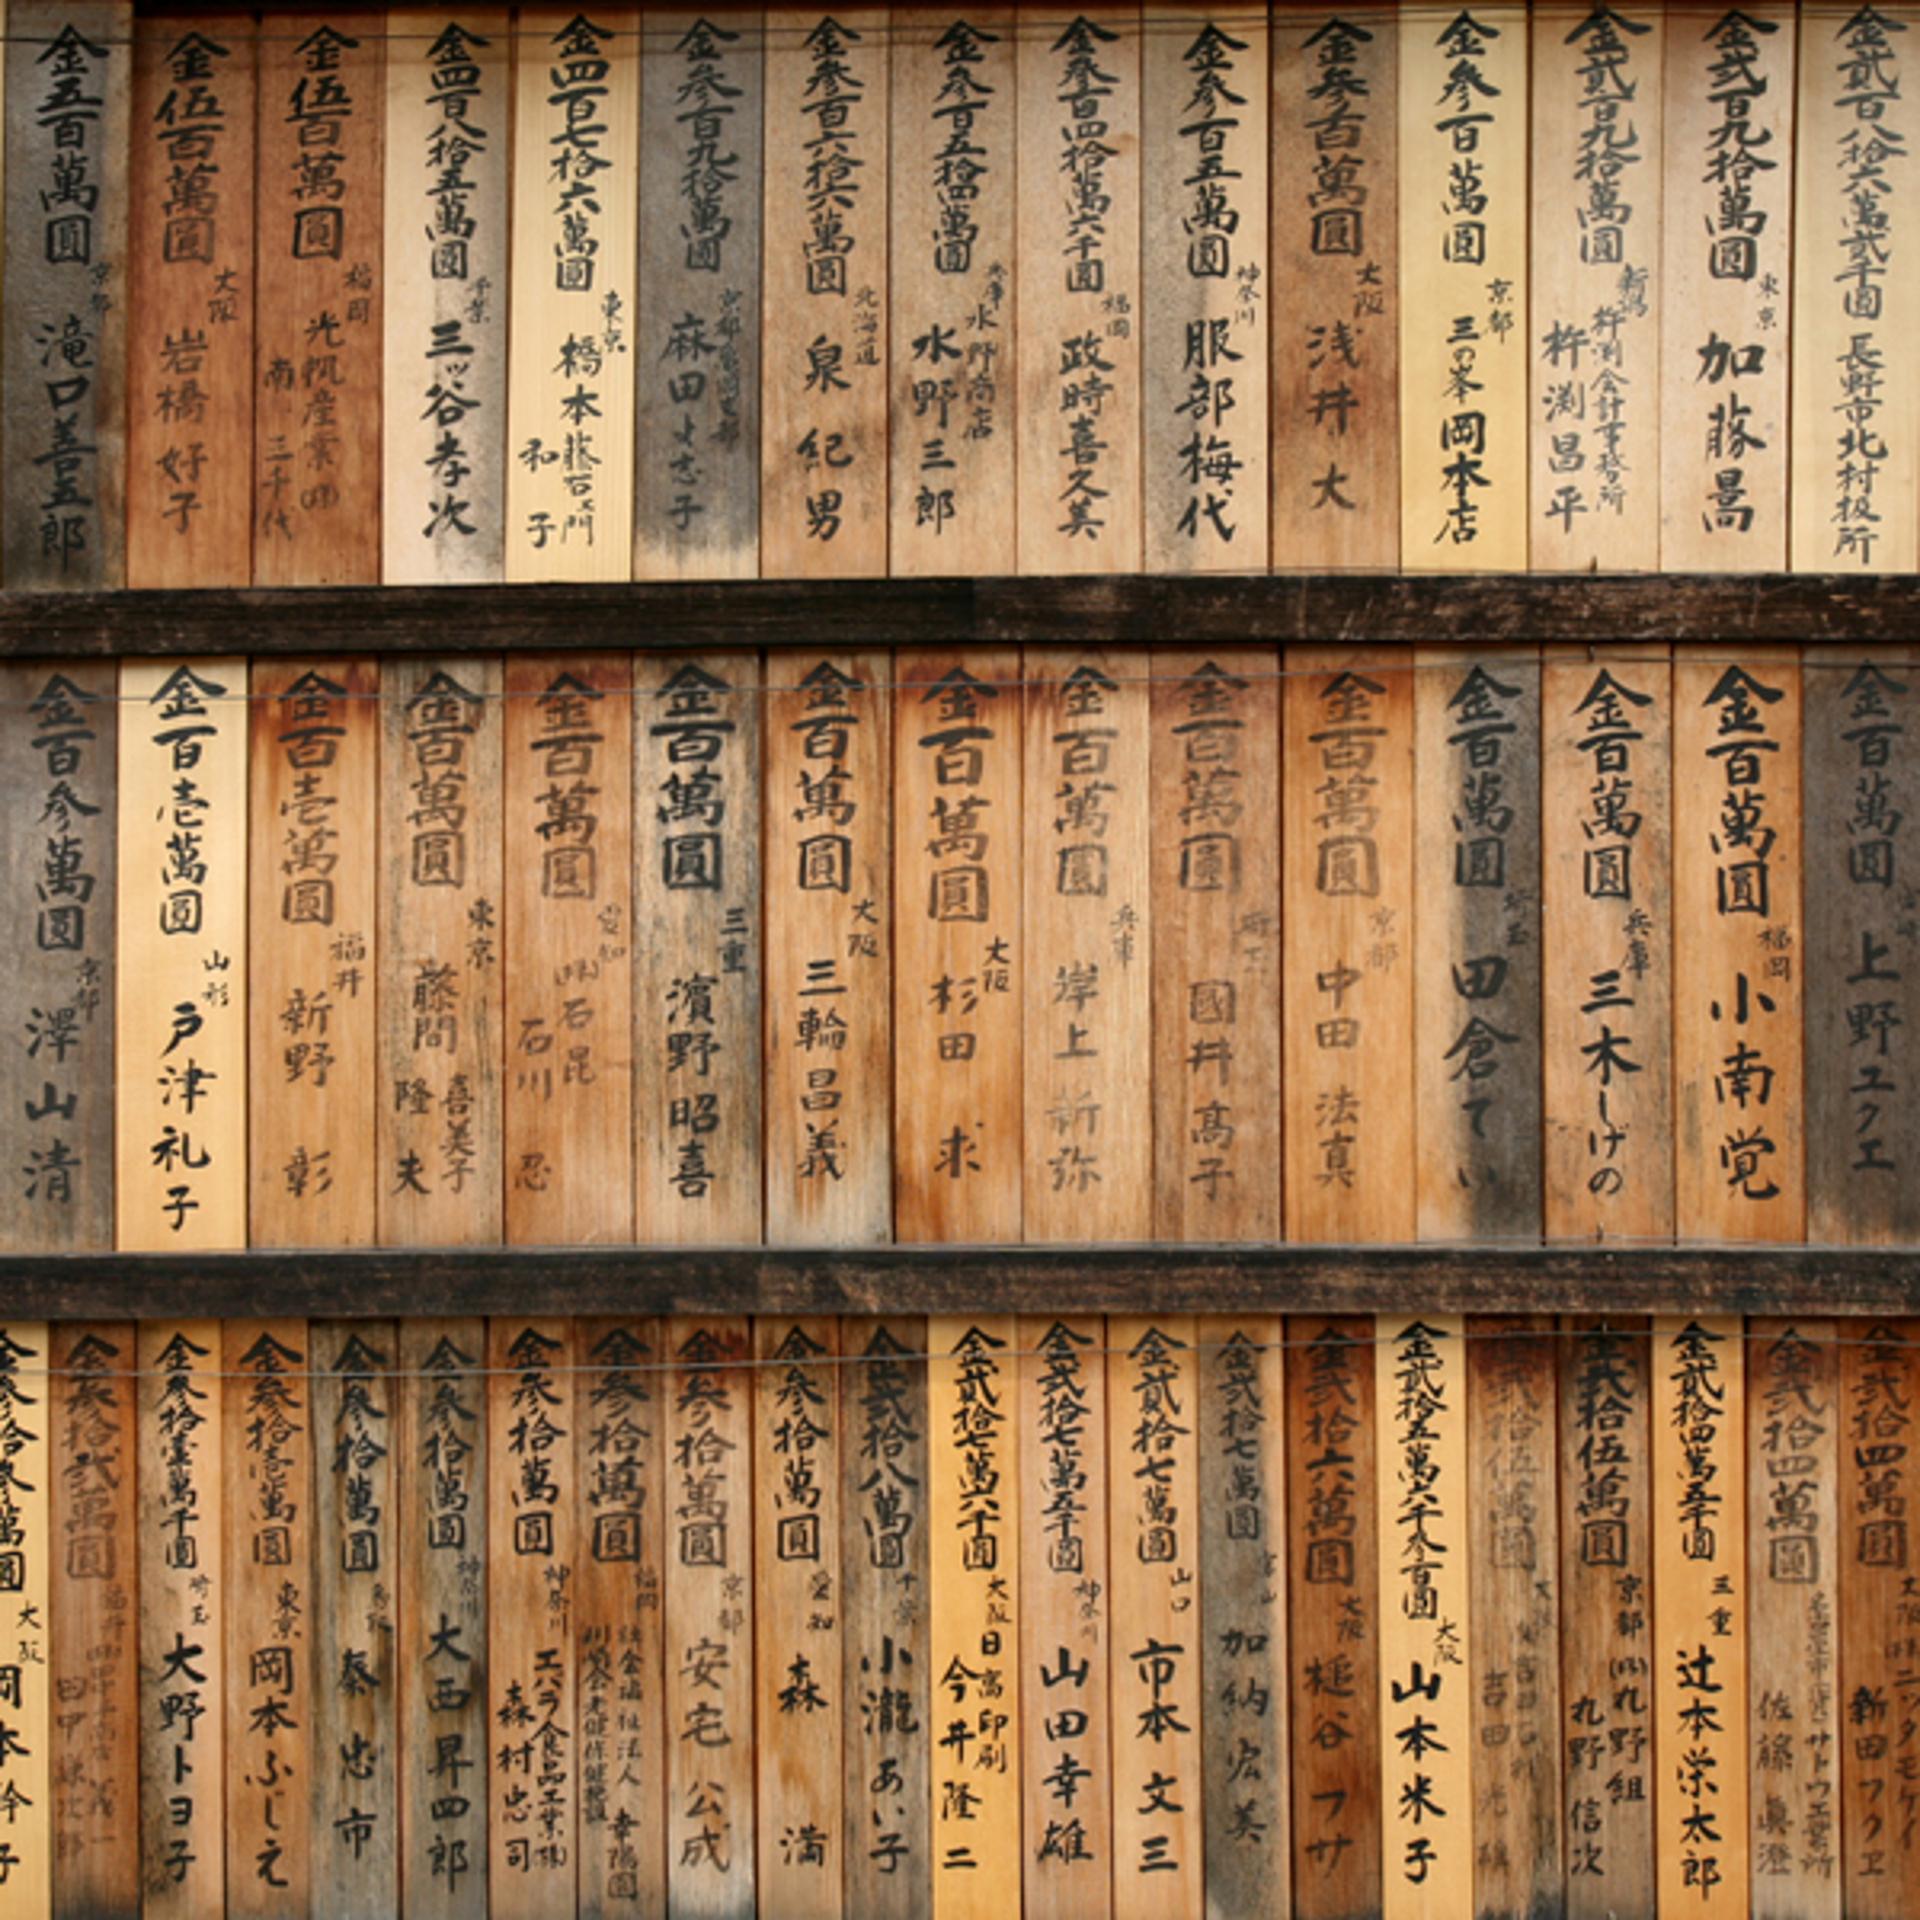 Wooden Tablets, Fushimi Inari Shrine, Japan by Cora Edmonds